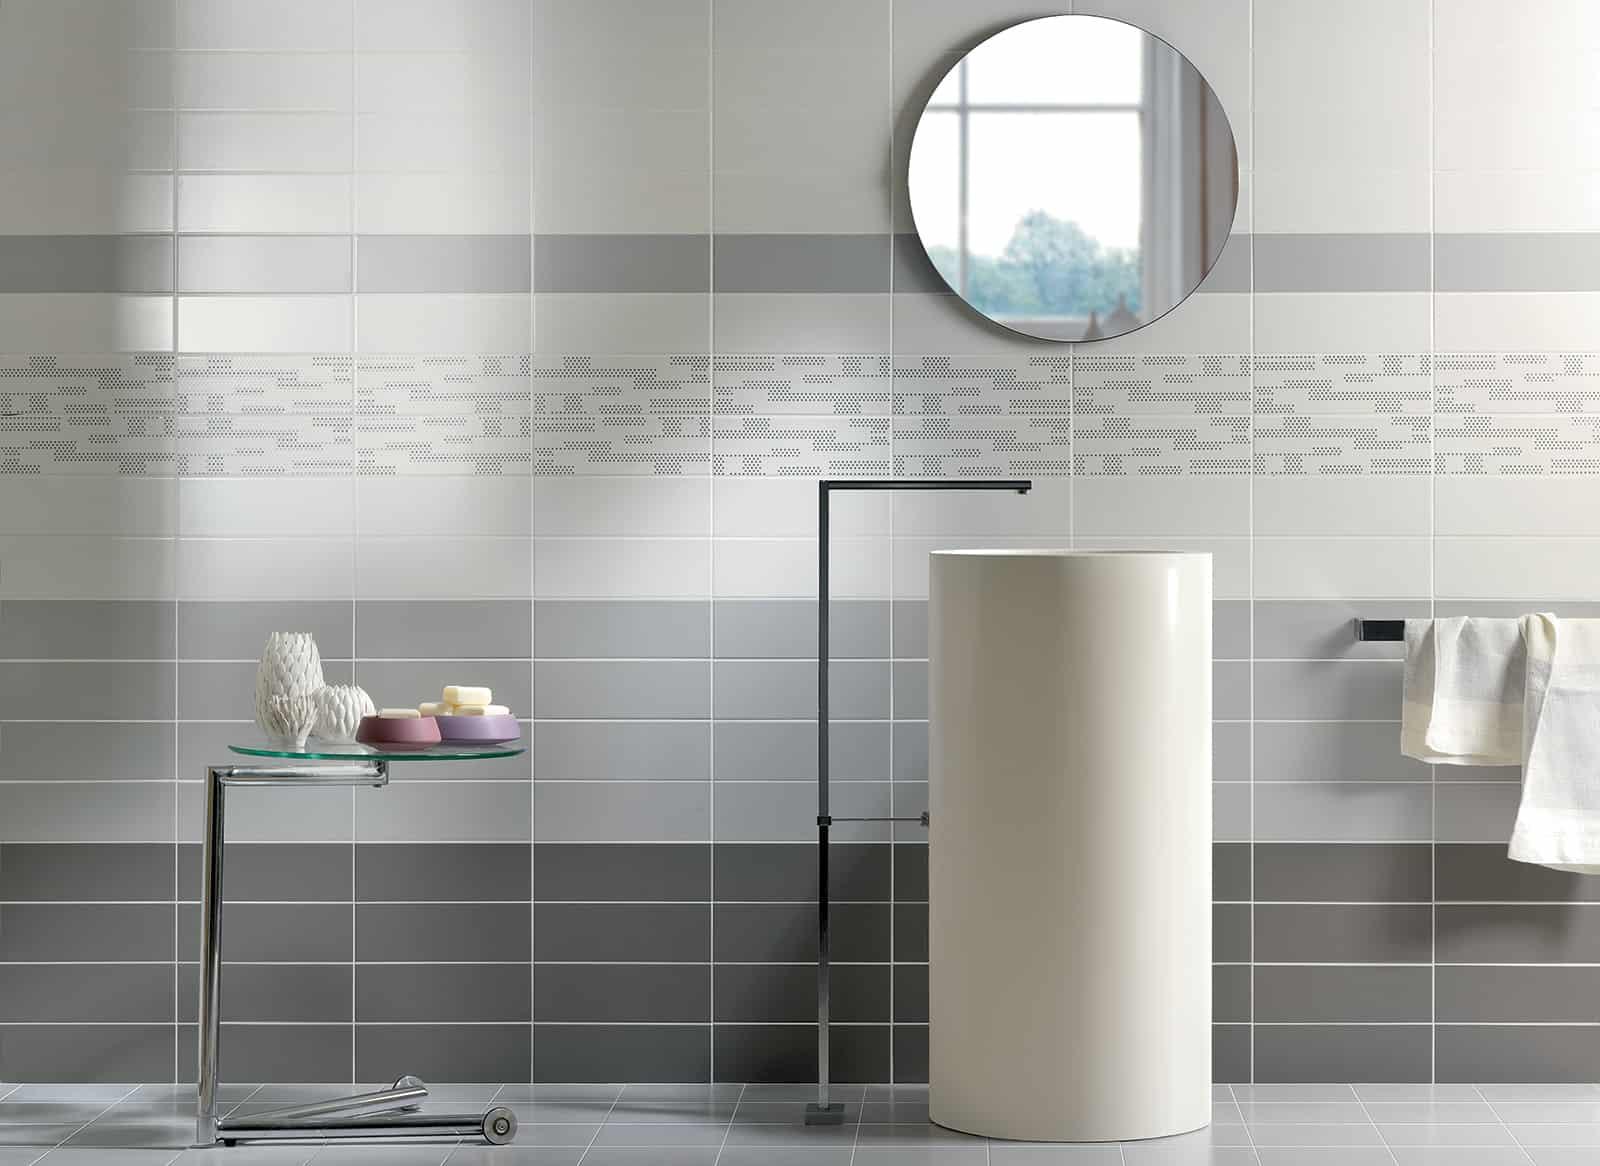 Tiffany rivestimento bagno grigio cemento wall musis ceramica for Bagno moderno grigio